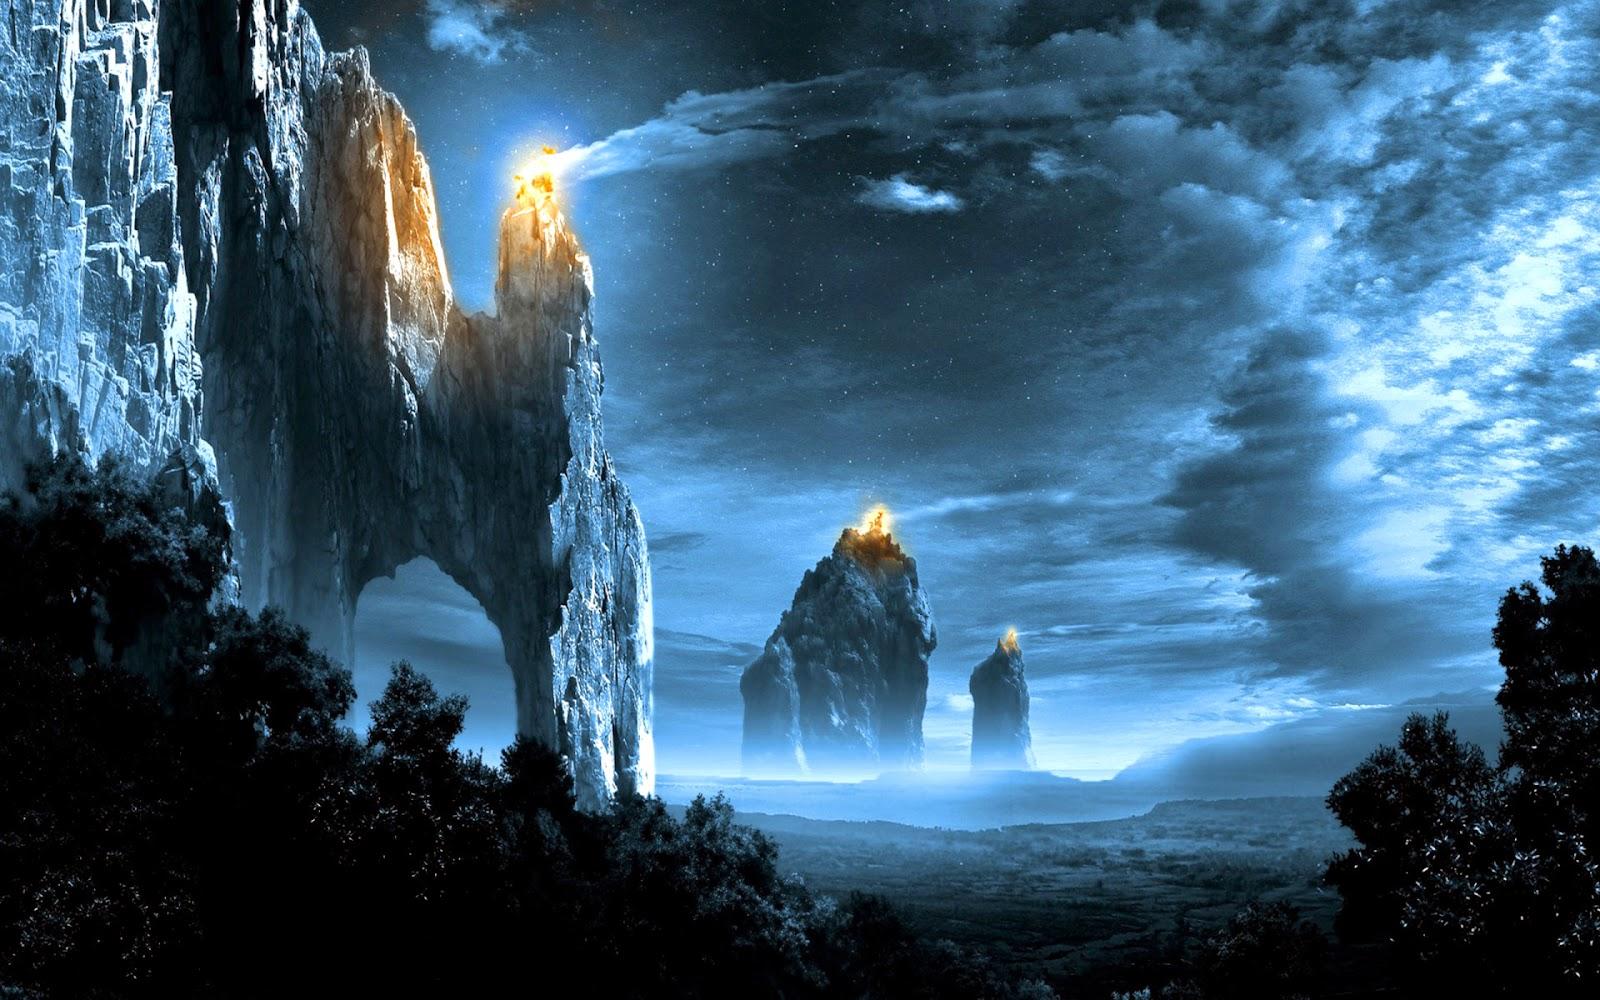 Immagini di paesaggi fantastici for Paesaggi desktop